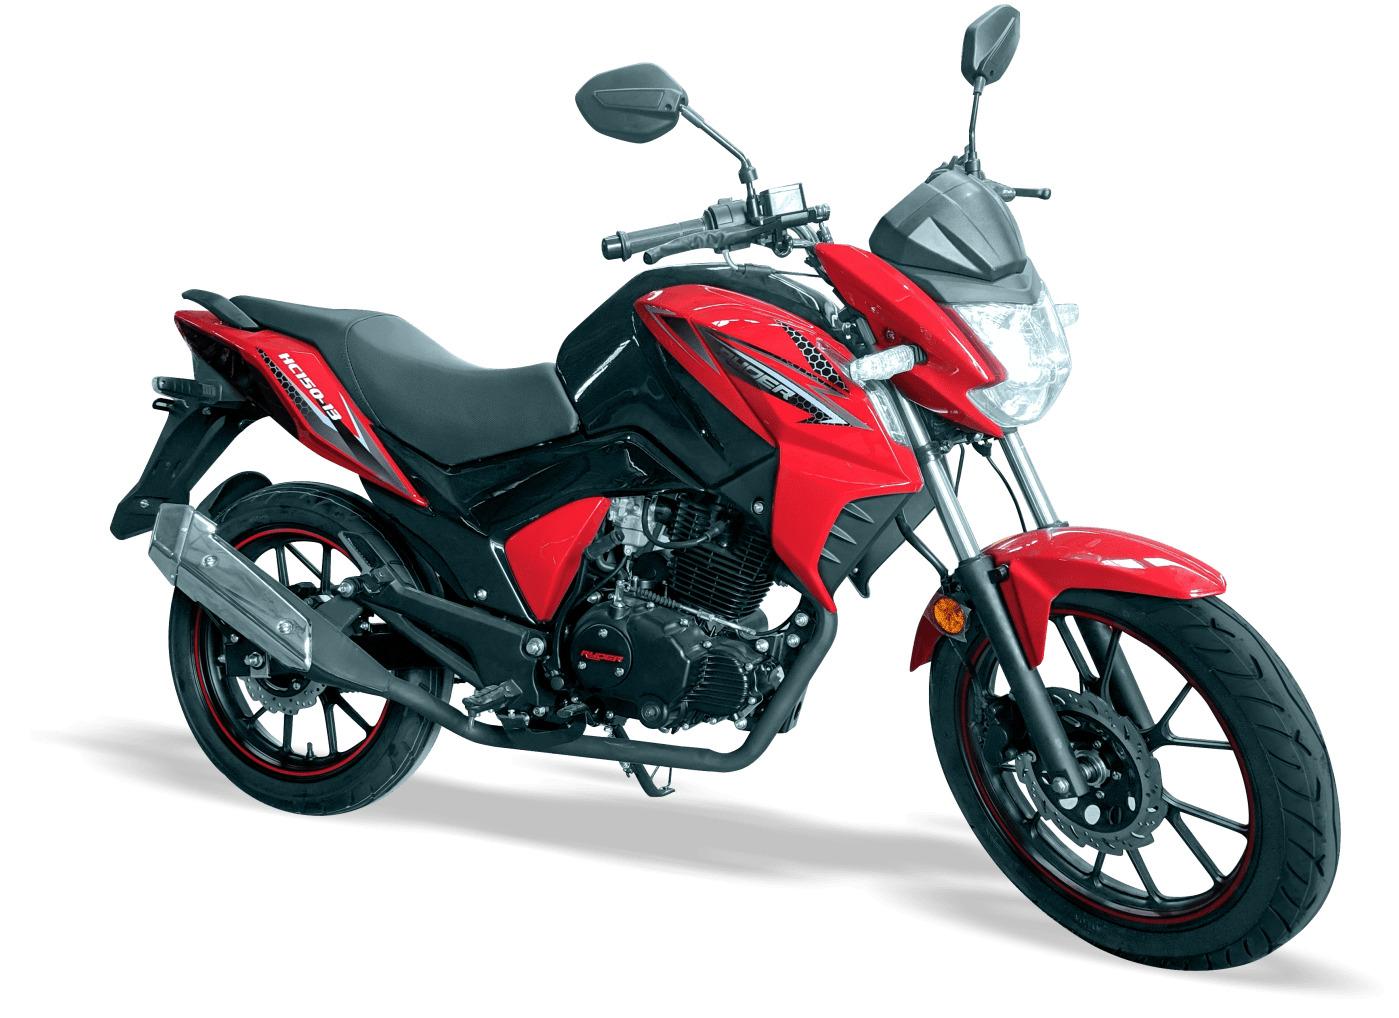 MOTO 150 RYDER HC150-13